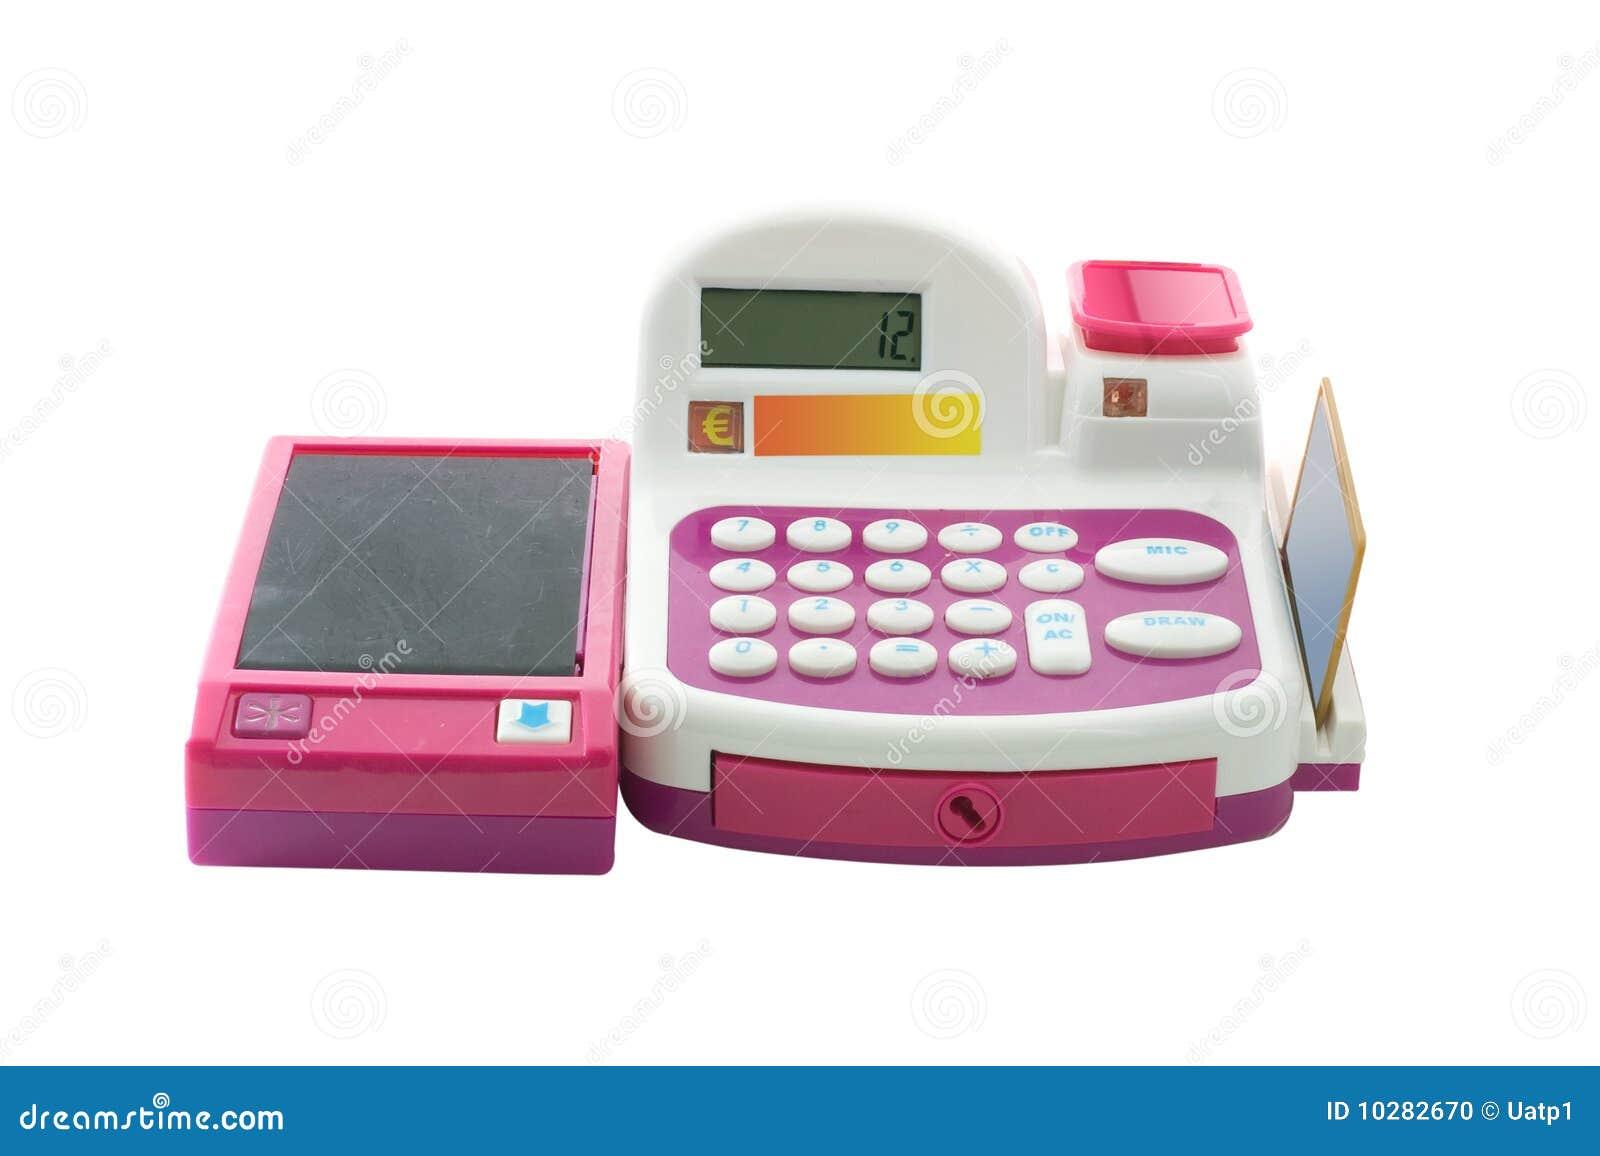 Caja registradora del juguete foto de archivo imagen - Caja registradora juguete ...